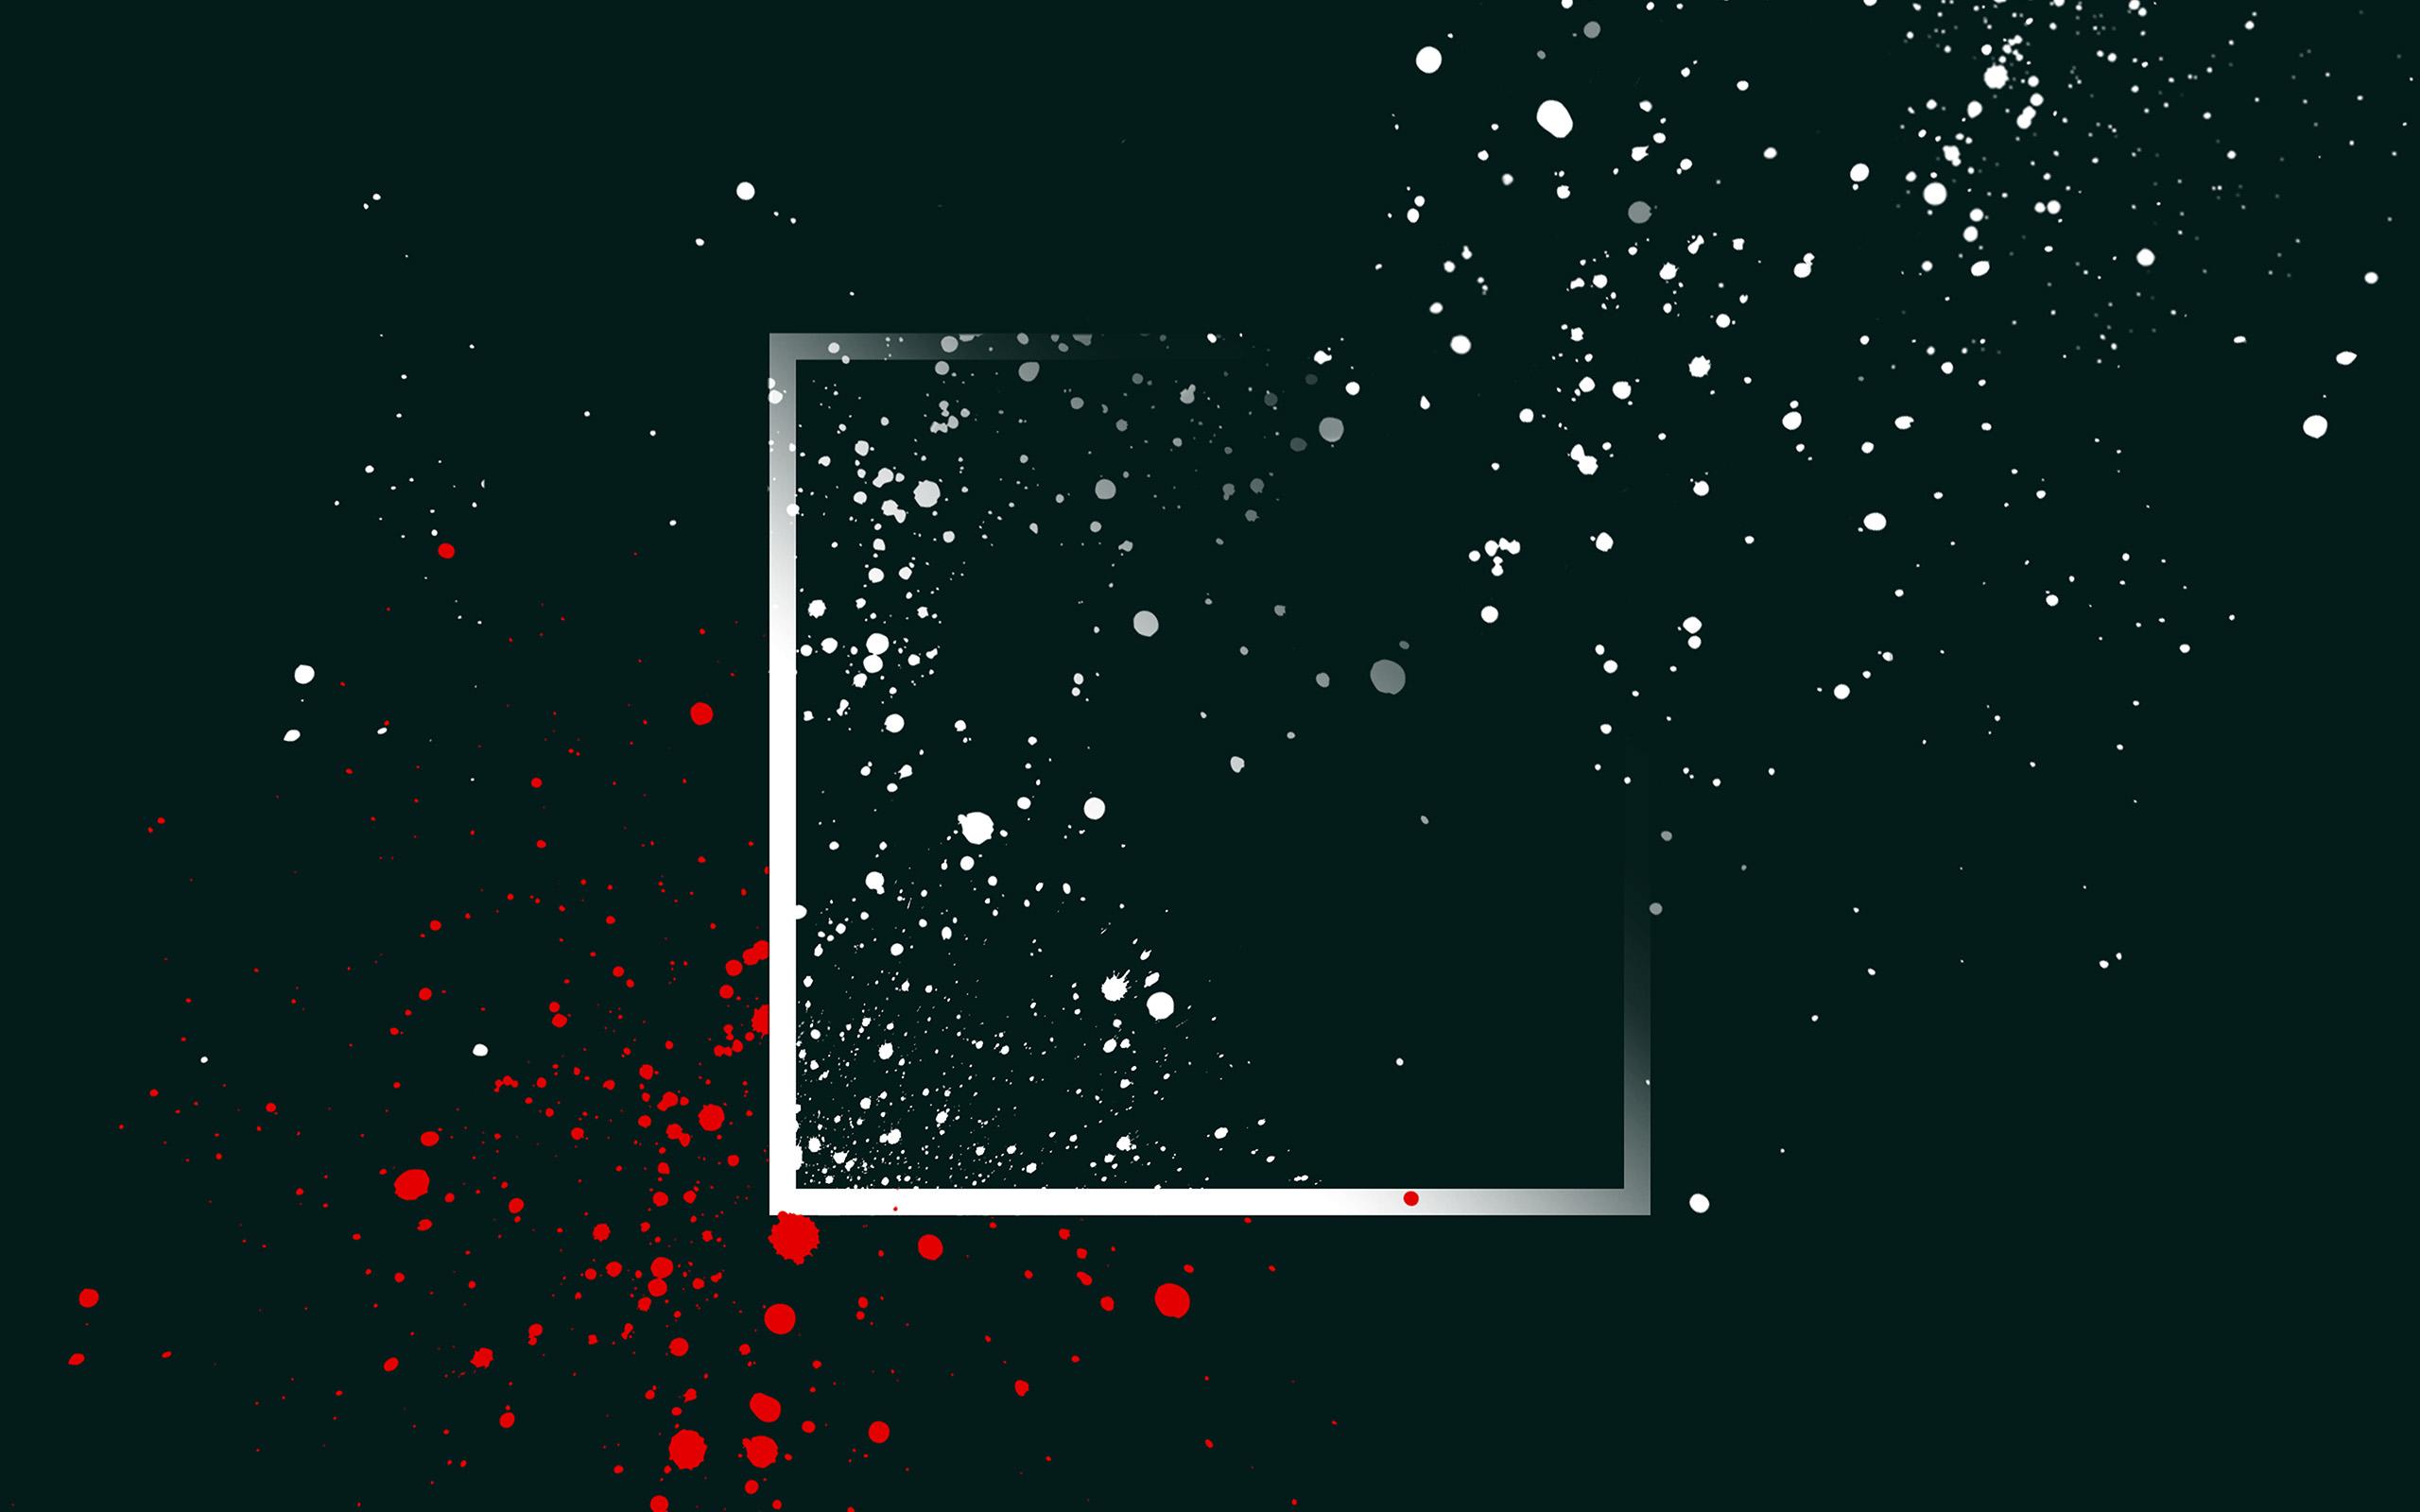 vu32-minimal-dots-patint-pattern-dark-red-wallpaper